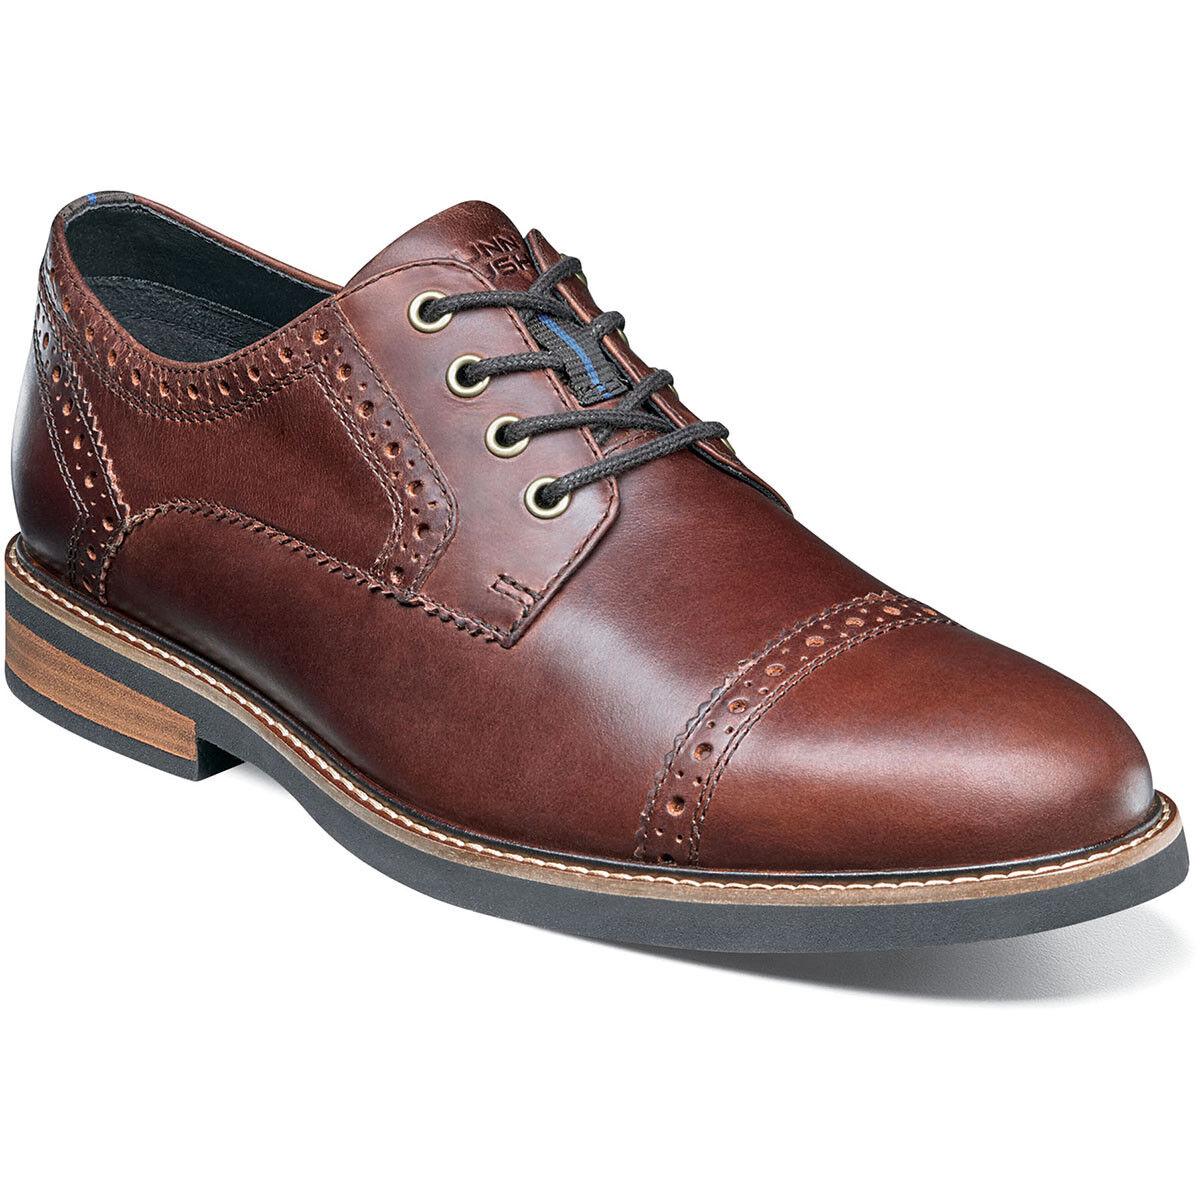 Nunn Bush Men's Overland Cap Toe Oxford Rust Leather shoes 84775-223